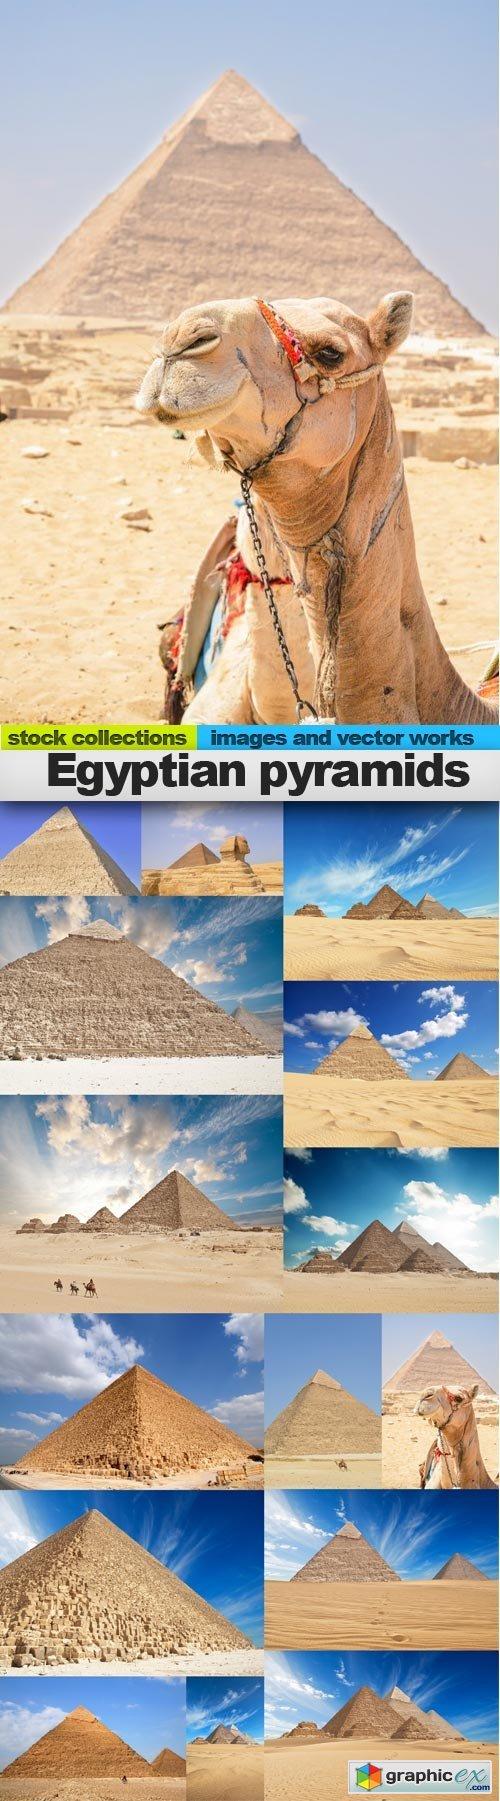 Egyptian pyramids, 15 x UHQ JPEG